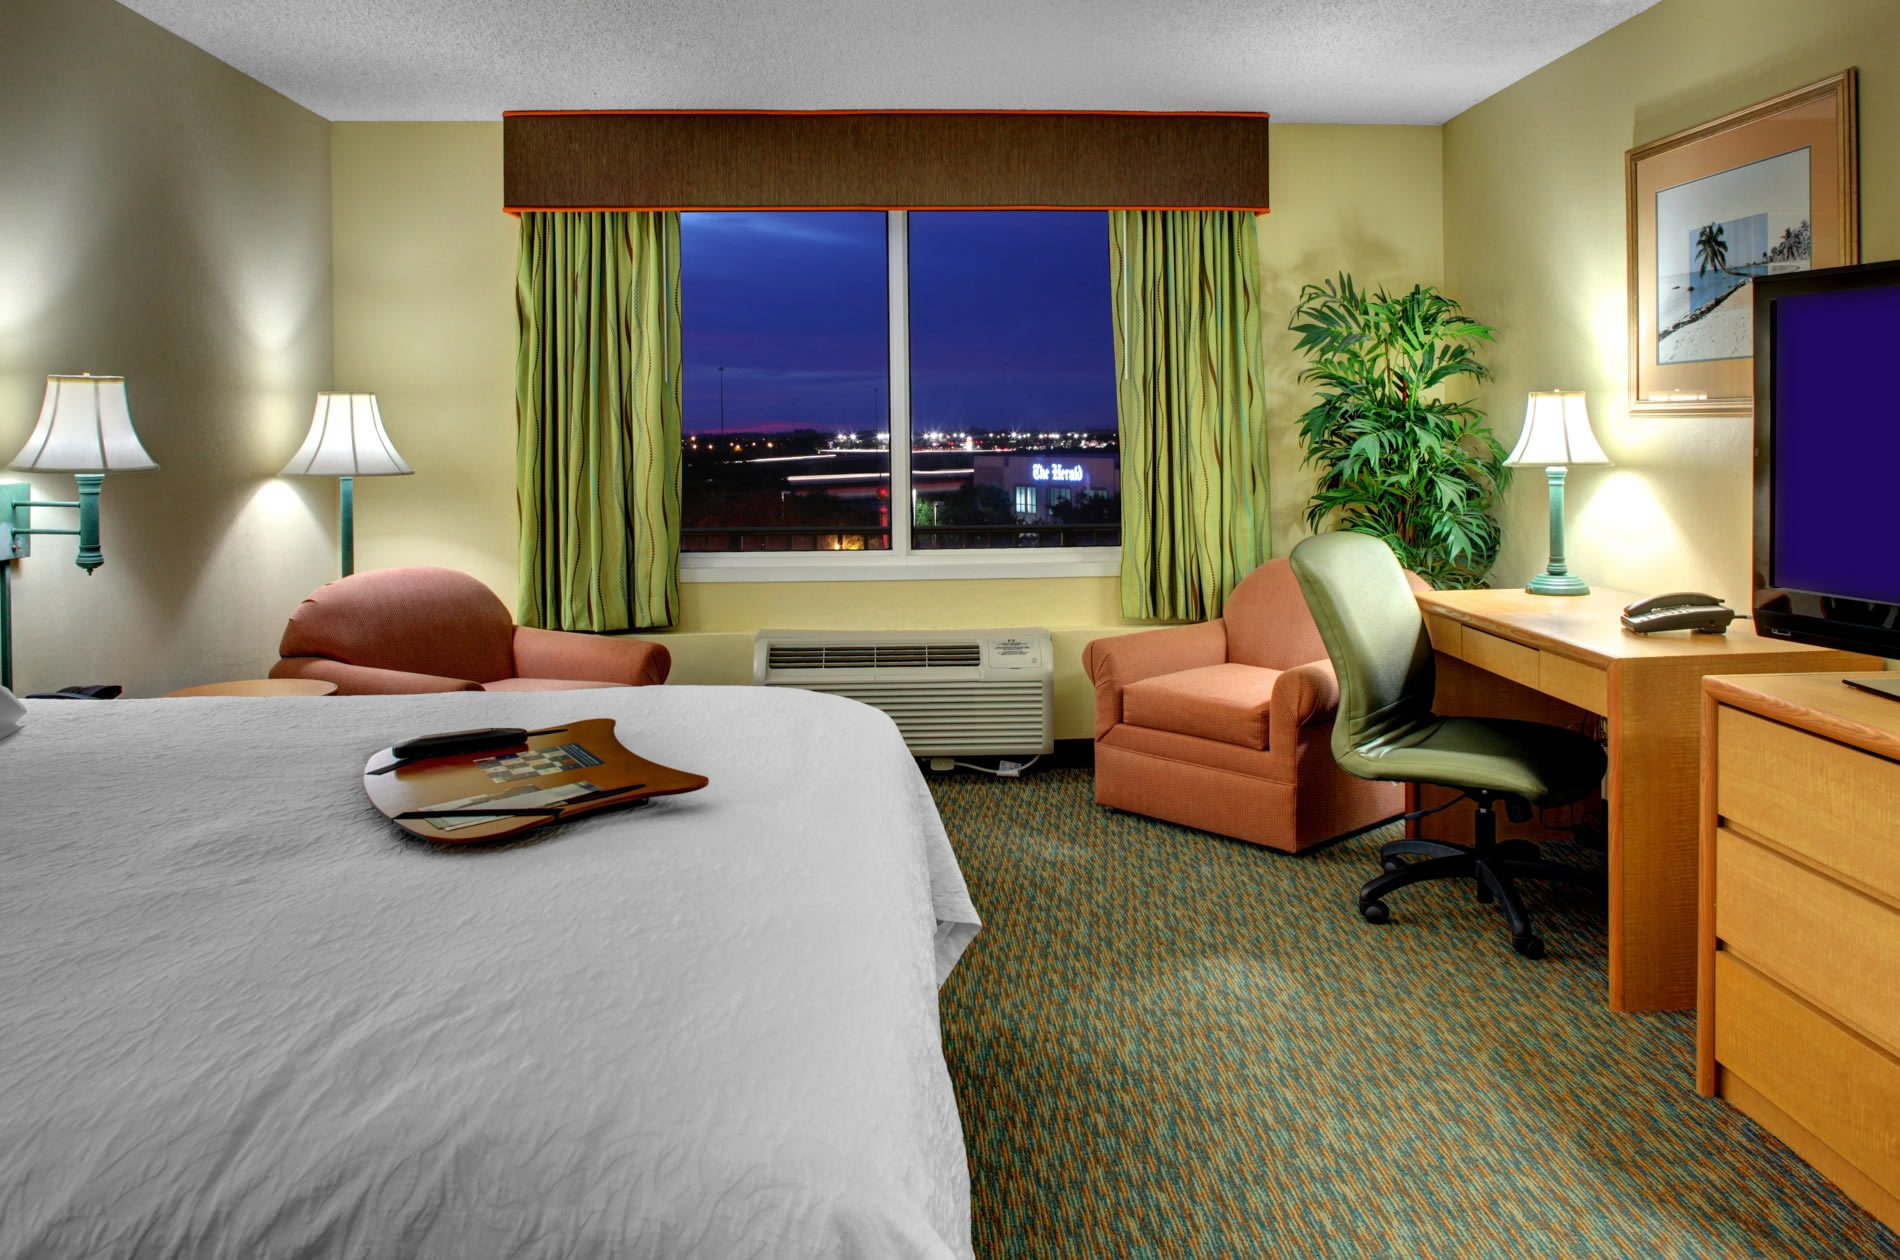 Hampton Inn by Hilton Pembroke Pines - Fort Lauderdale West image 6